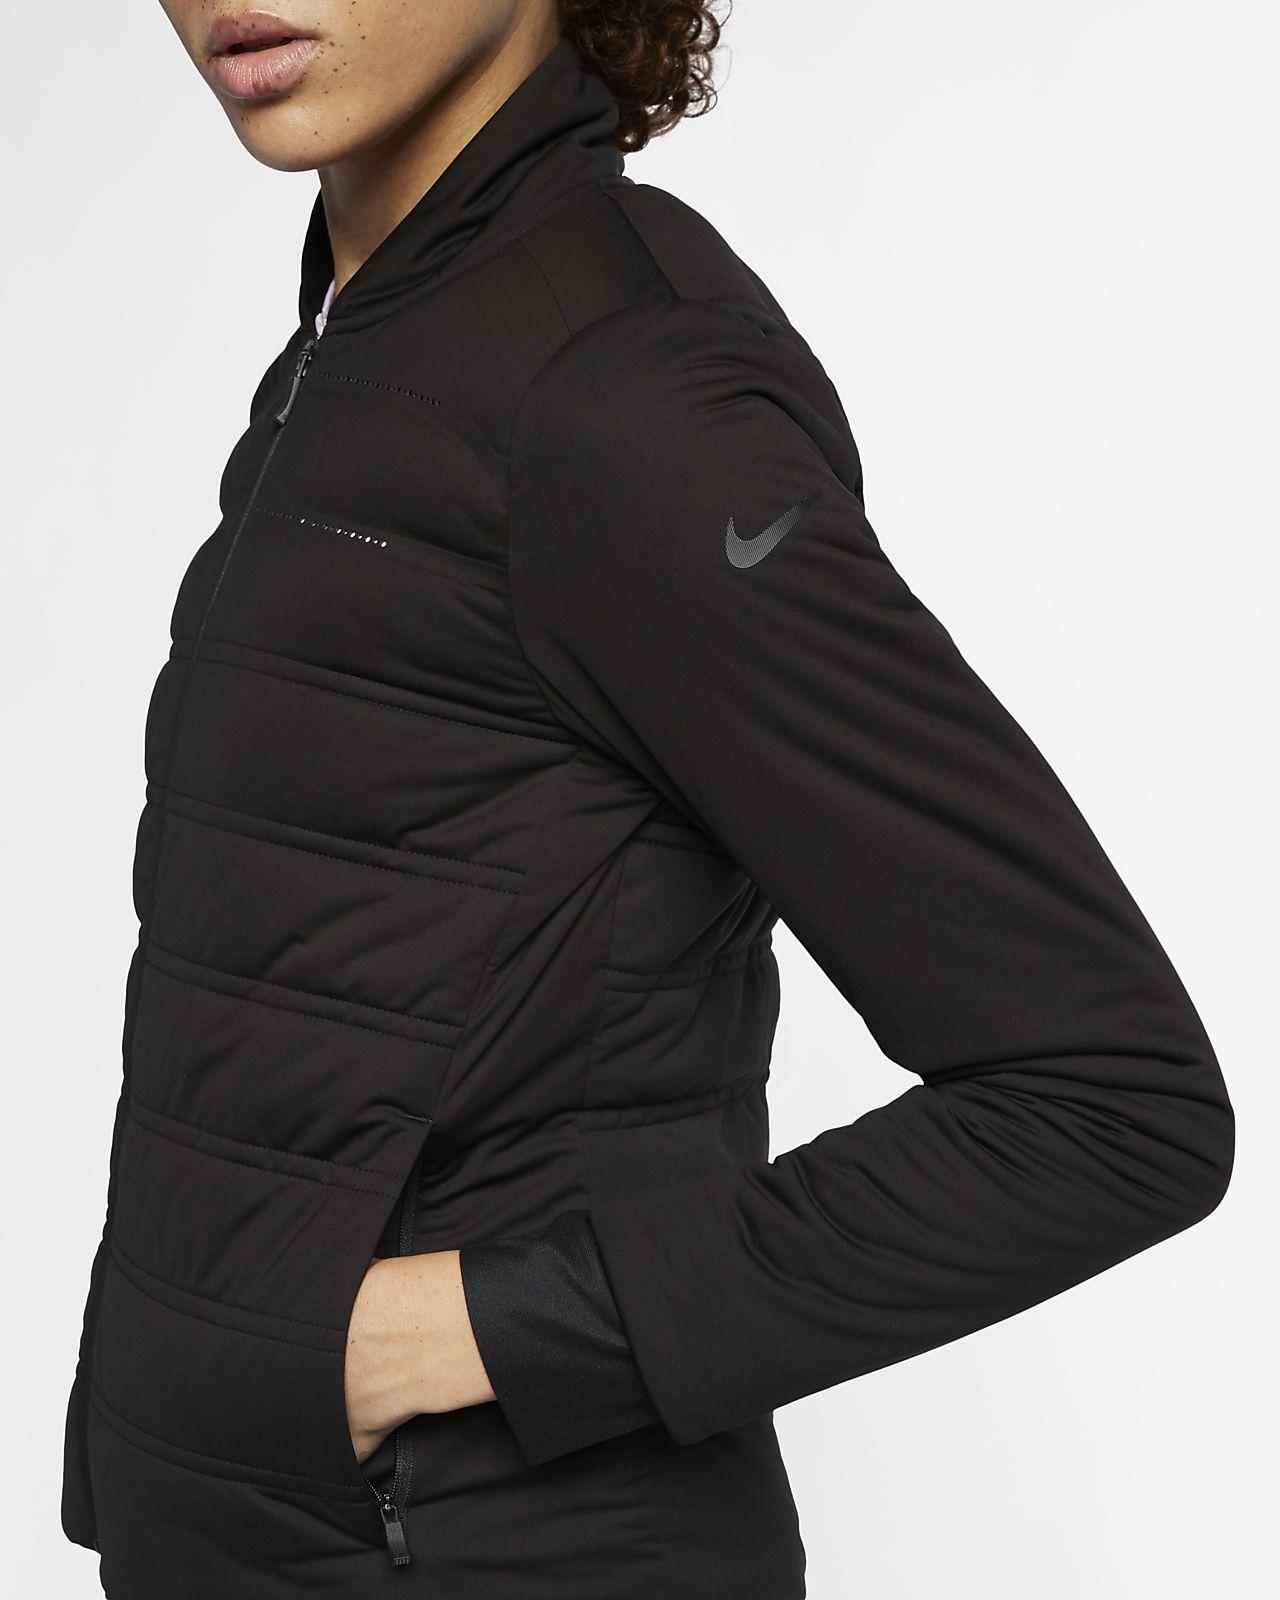 ce762f6b Женская куртка для гольфа Nike AeroLoft. Nike.com RU